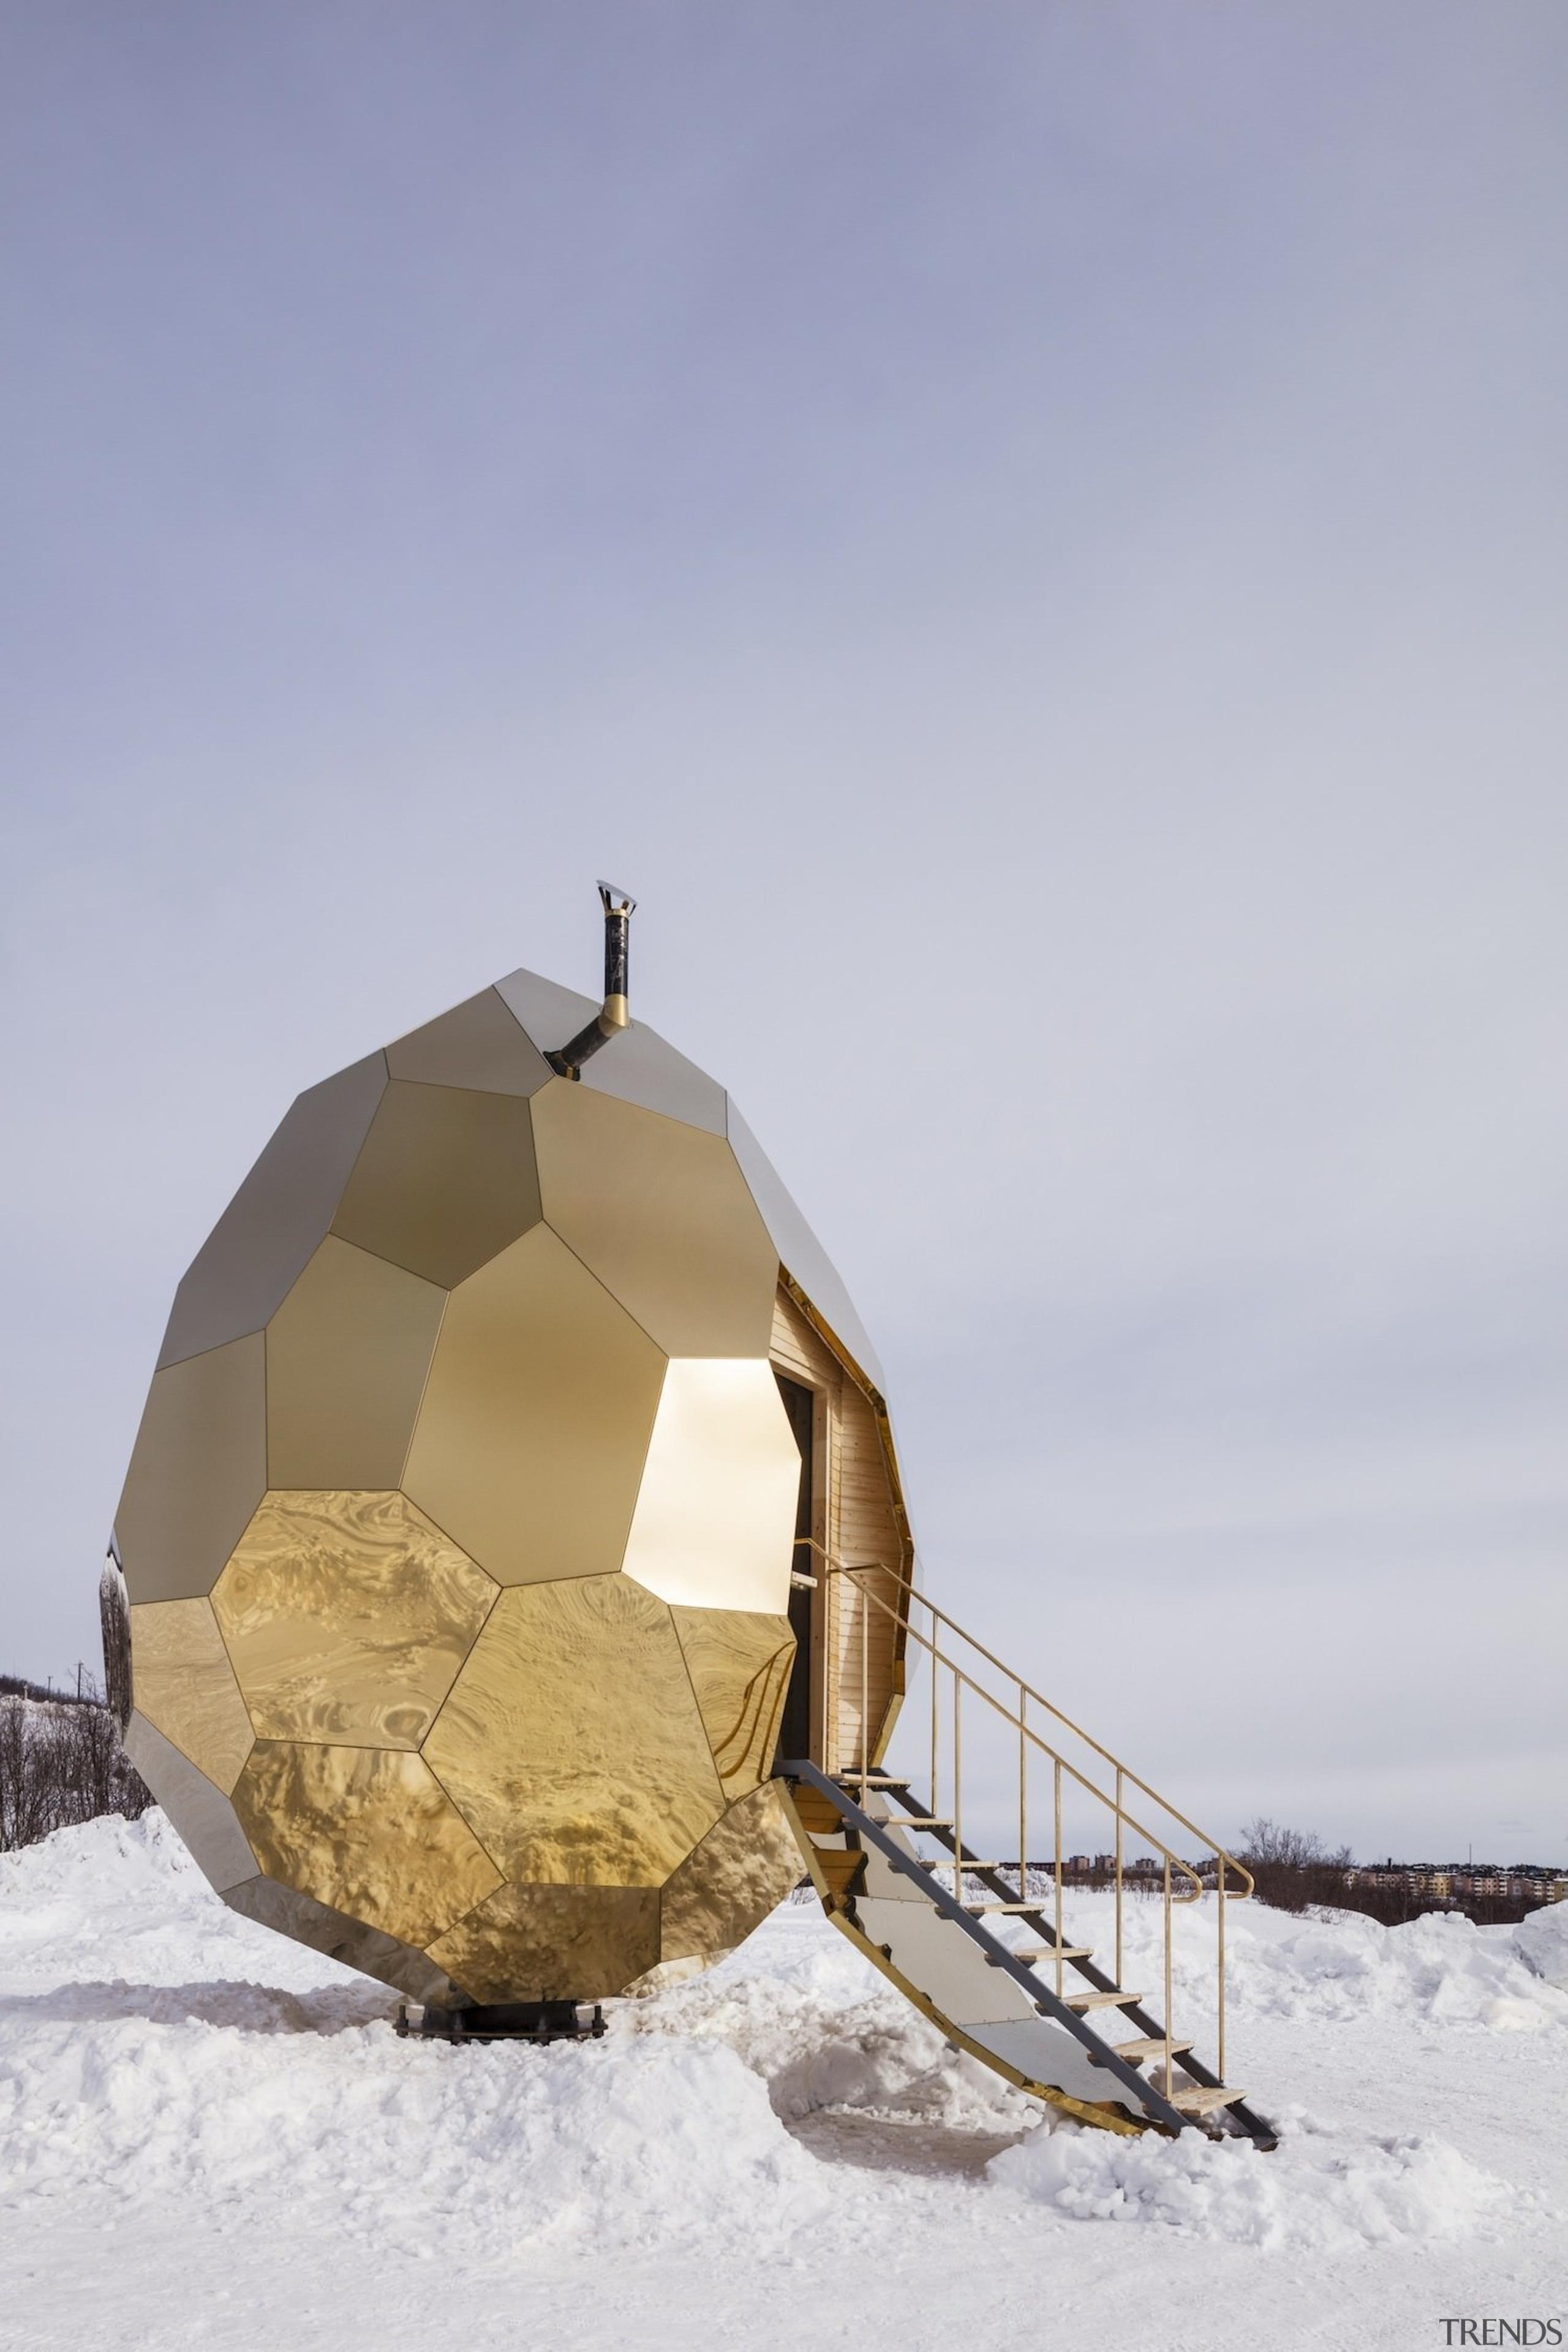 Designed by Bigert & BergströmPhotography by Jean-Baptiste arctic, ice, sky, snow, winter, gray